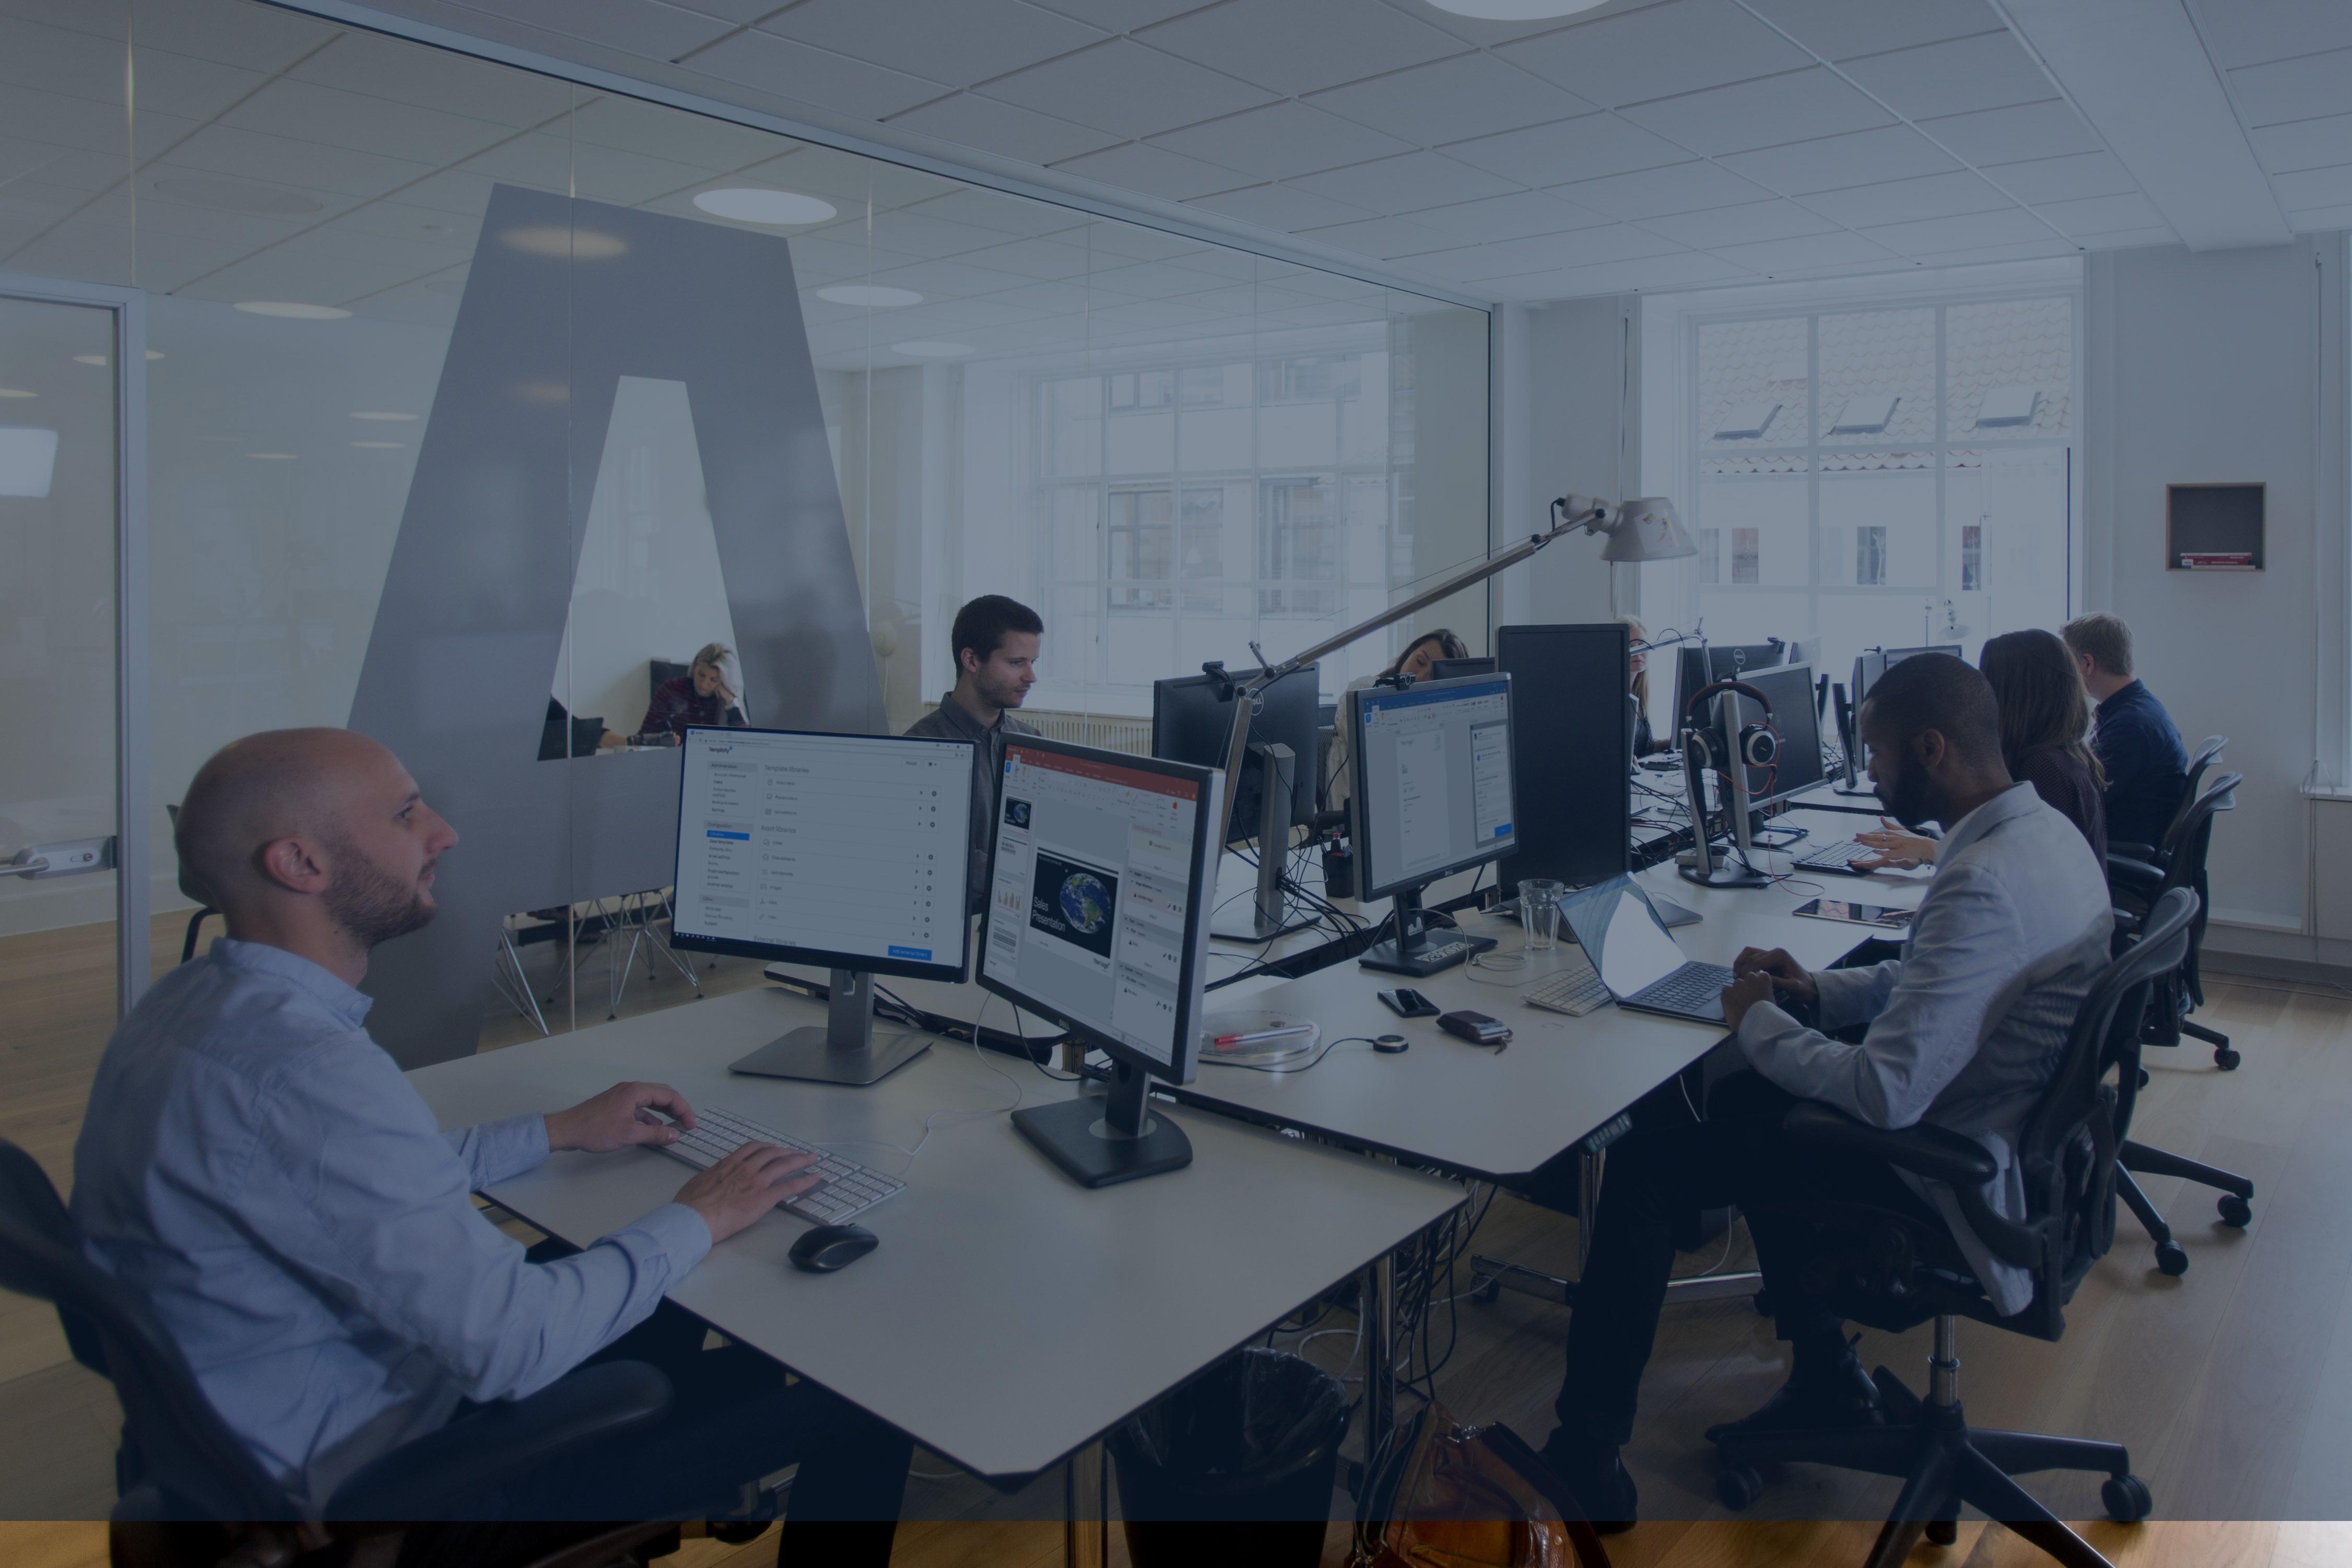 Conferenceroom Systems